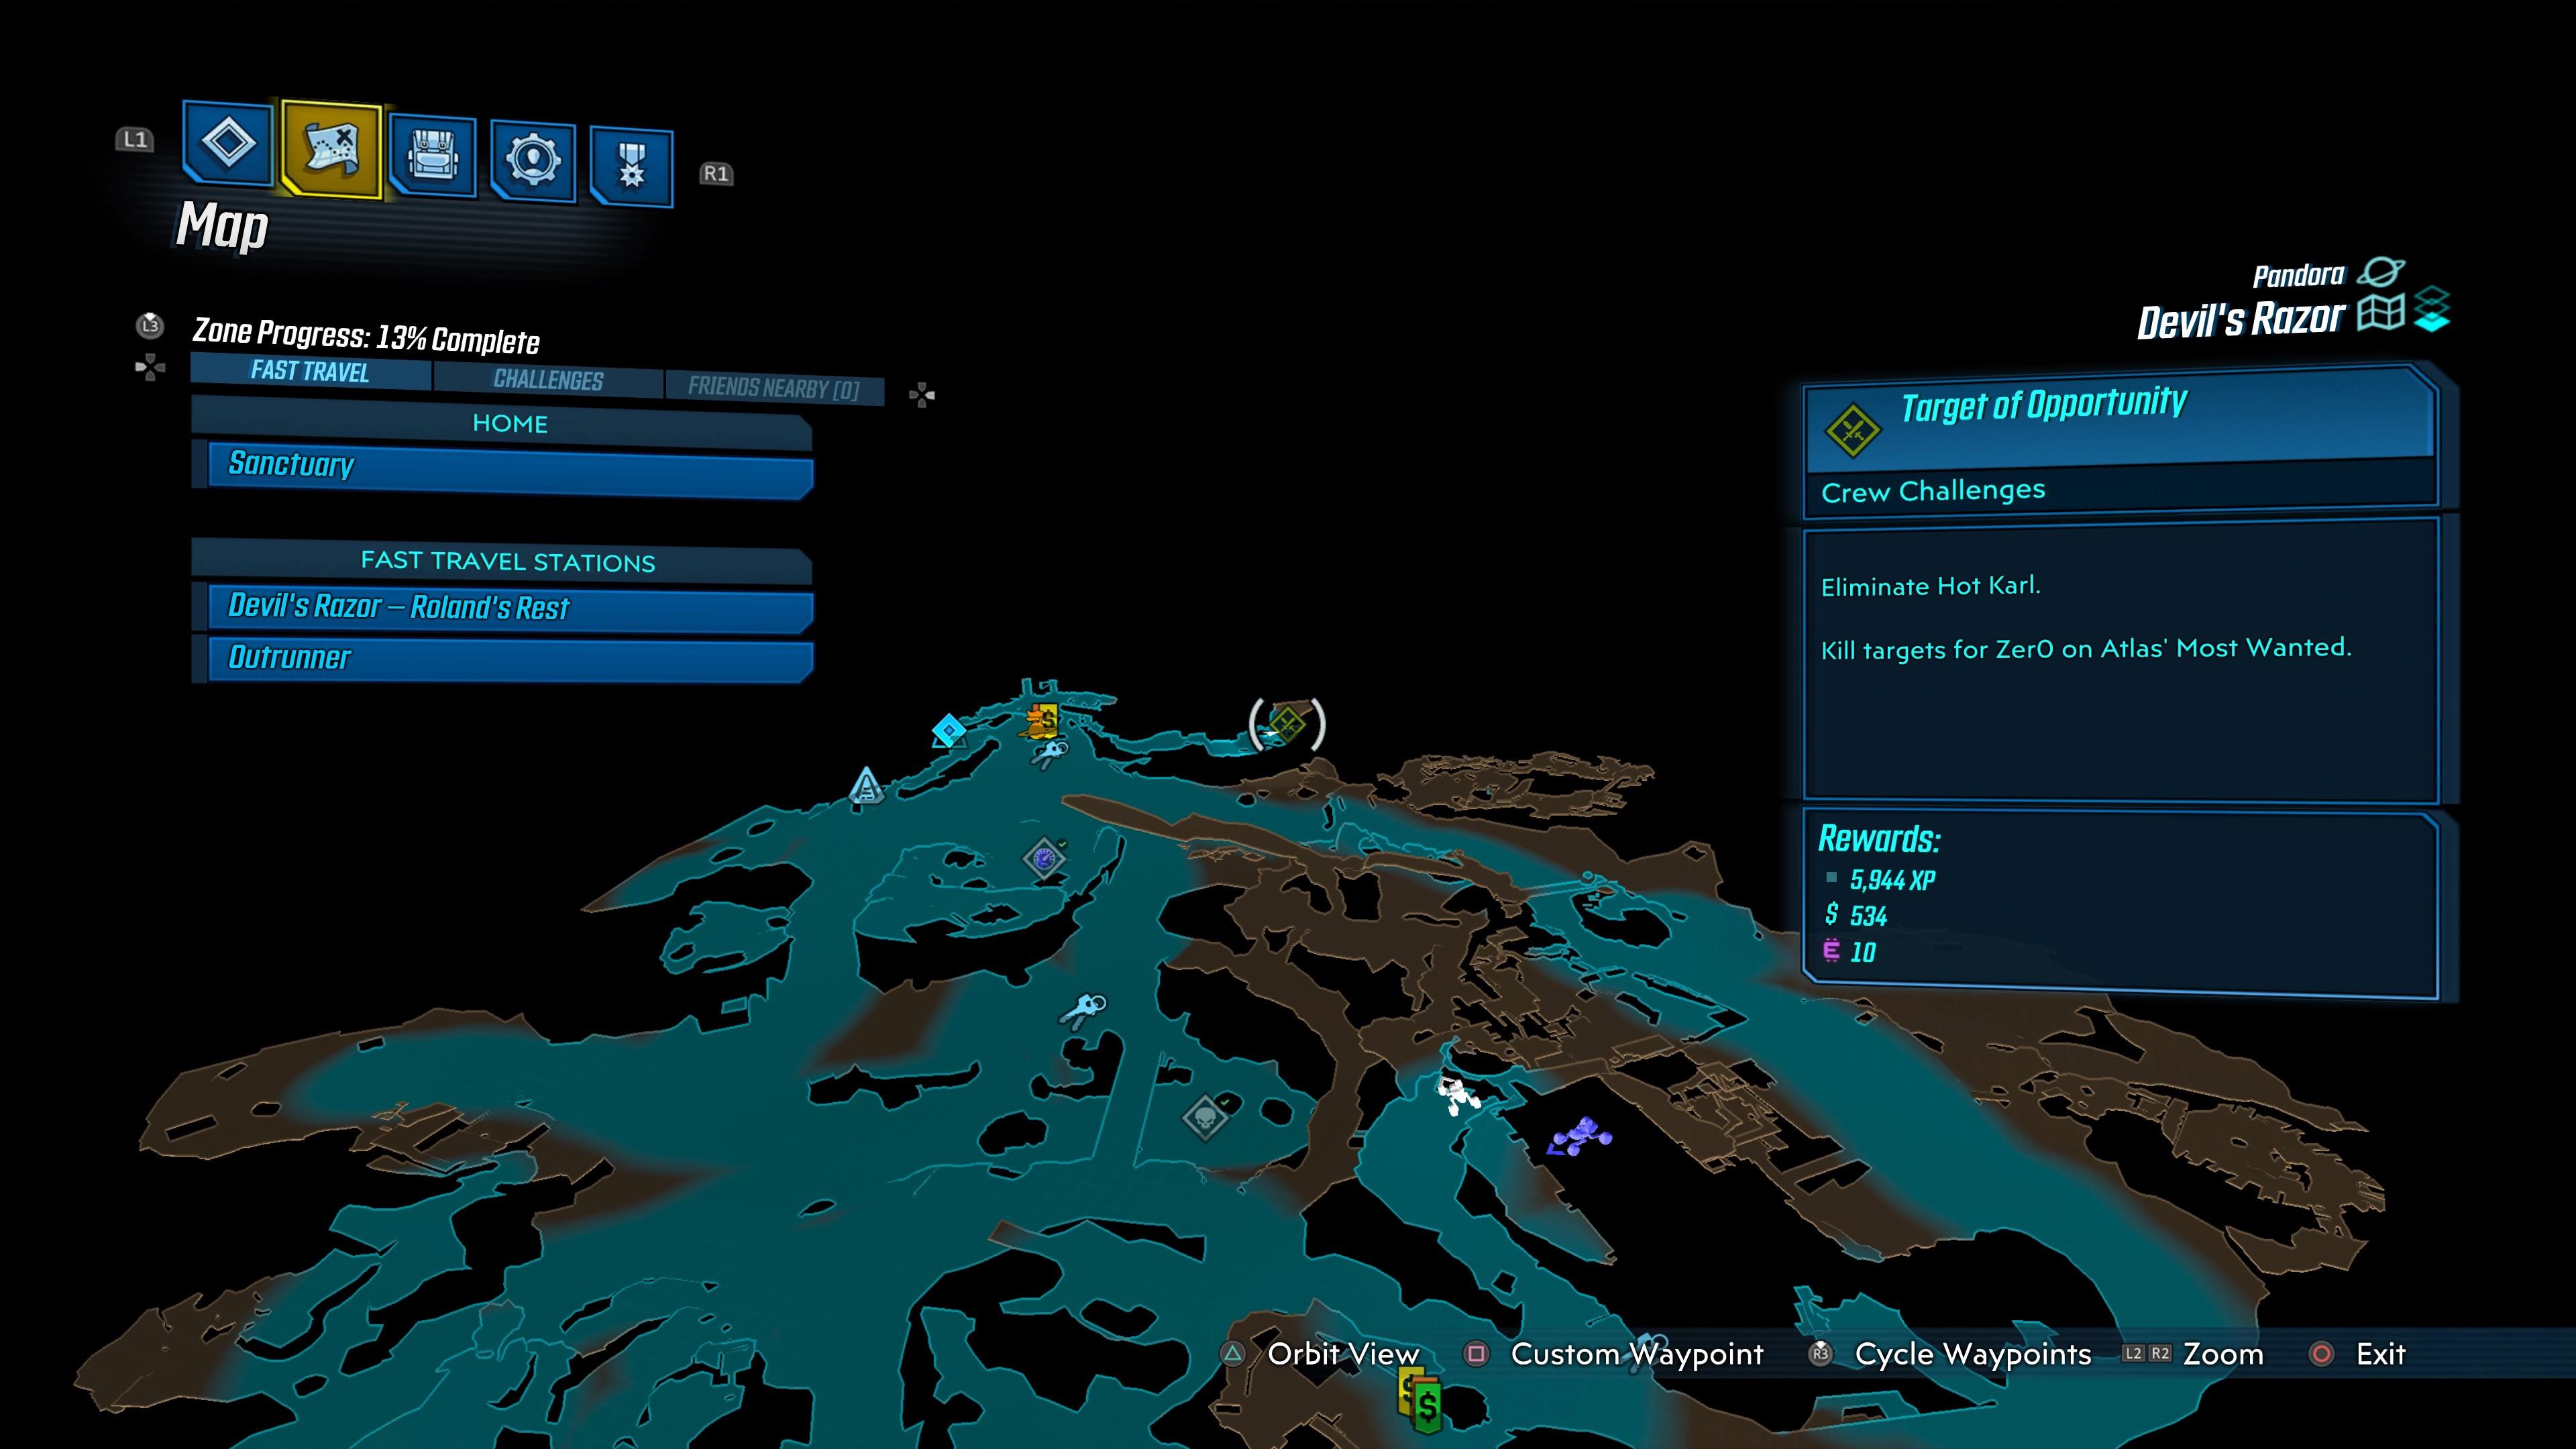 Zer0ed In Trophy Borderlands 3 Psnprofiles Com